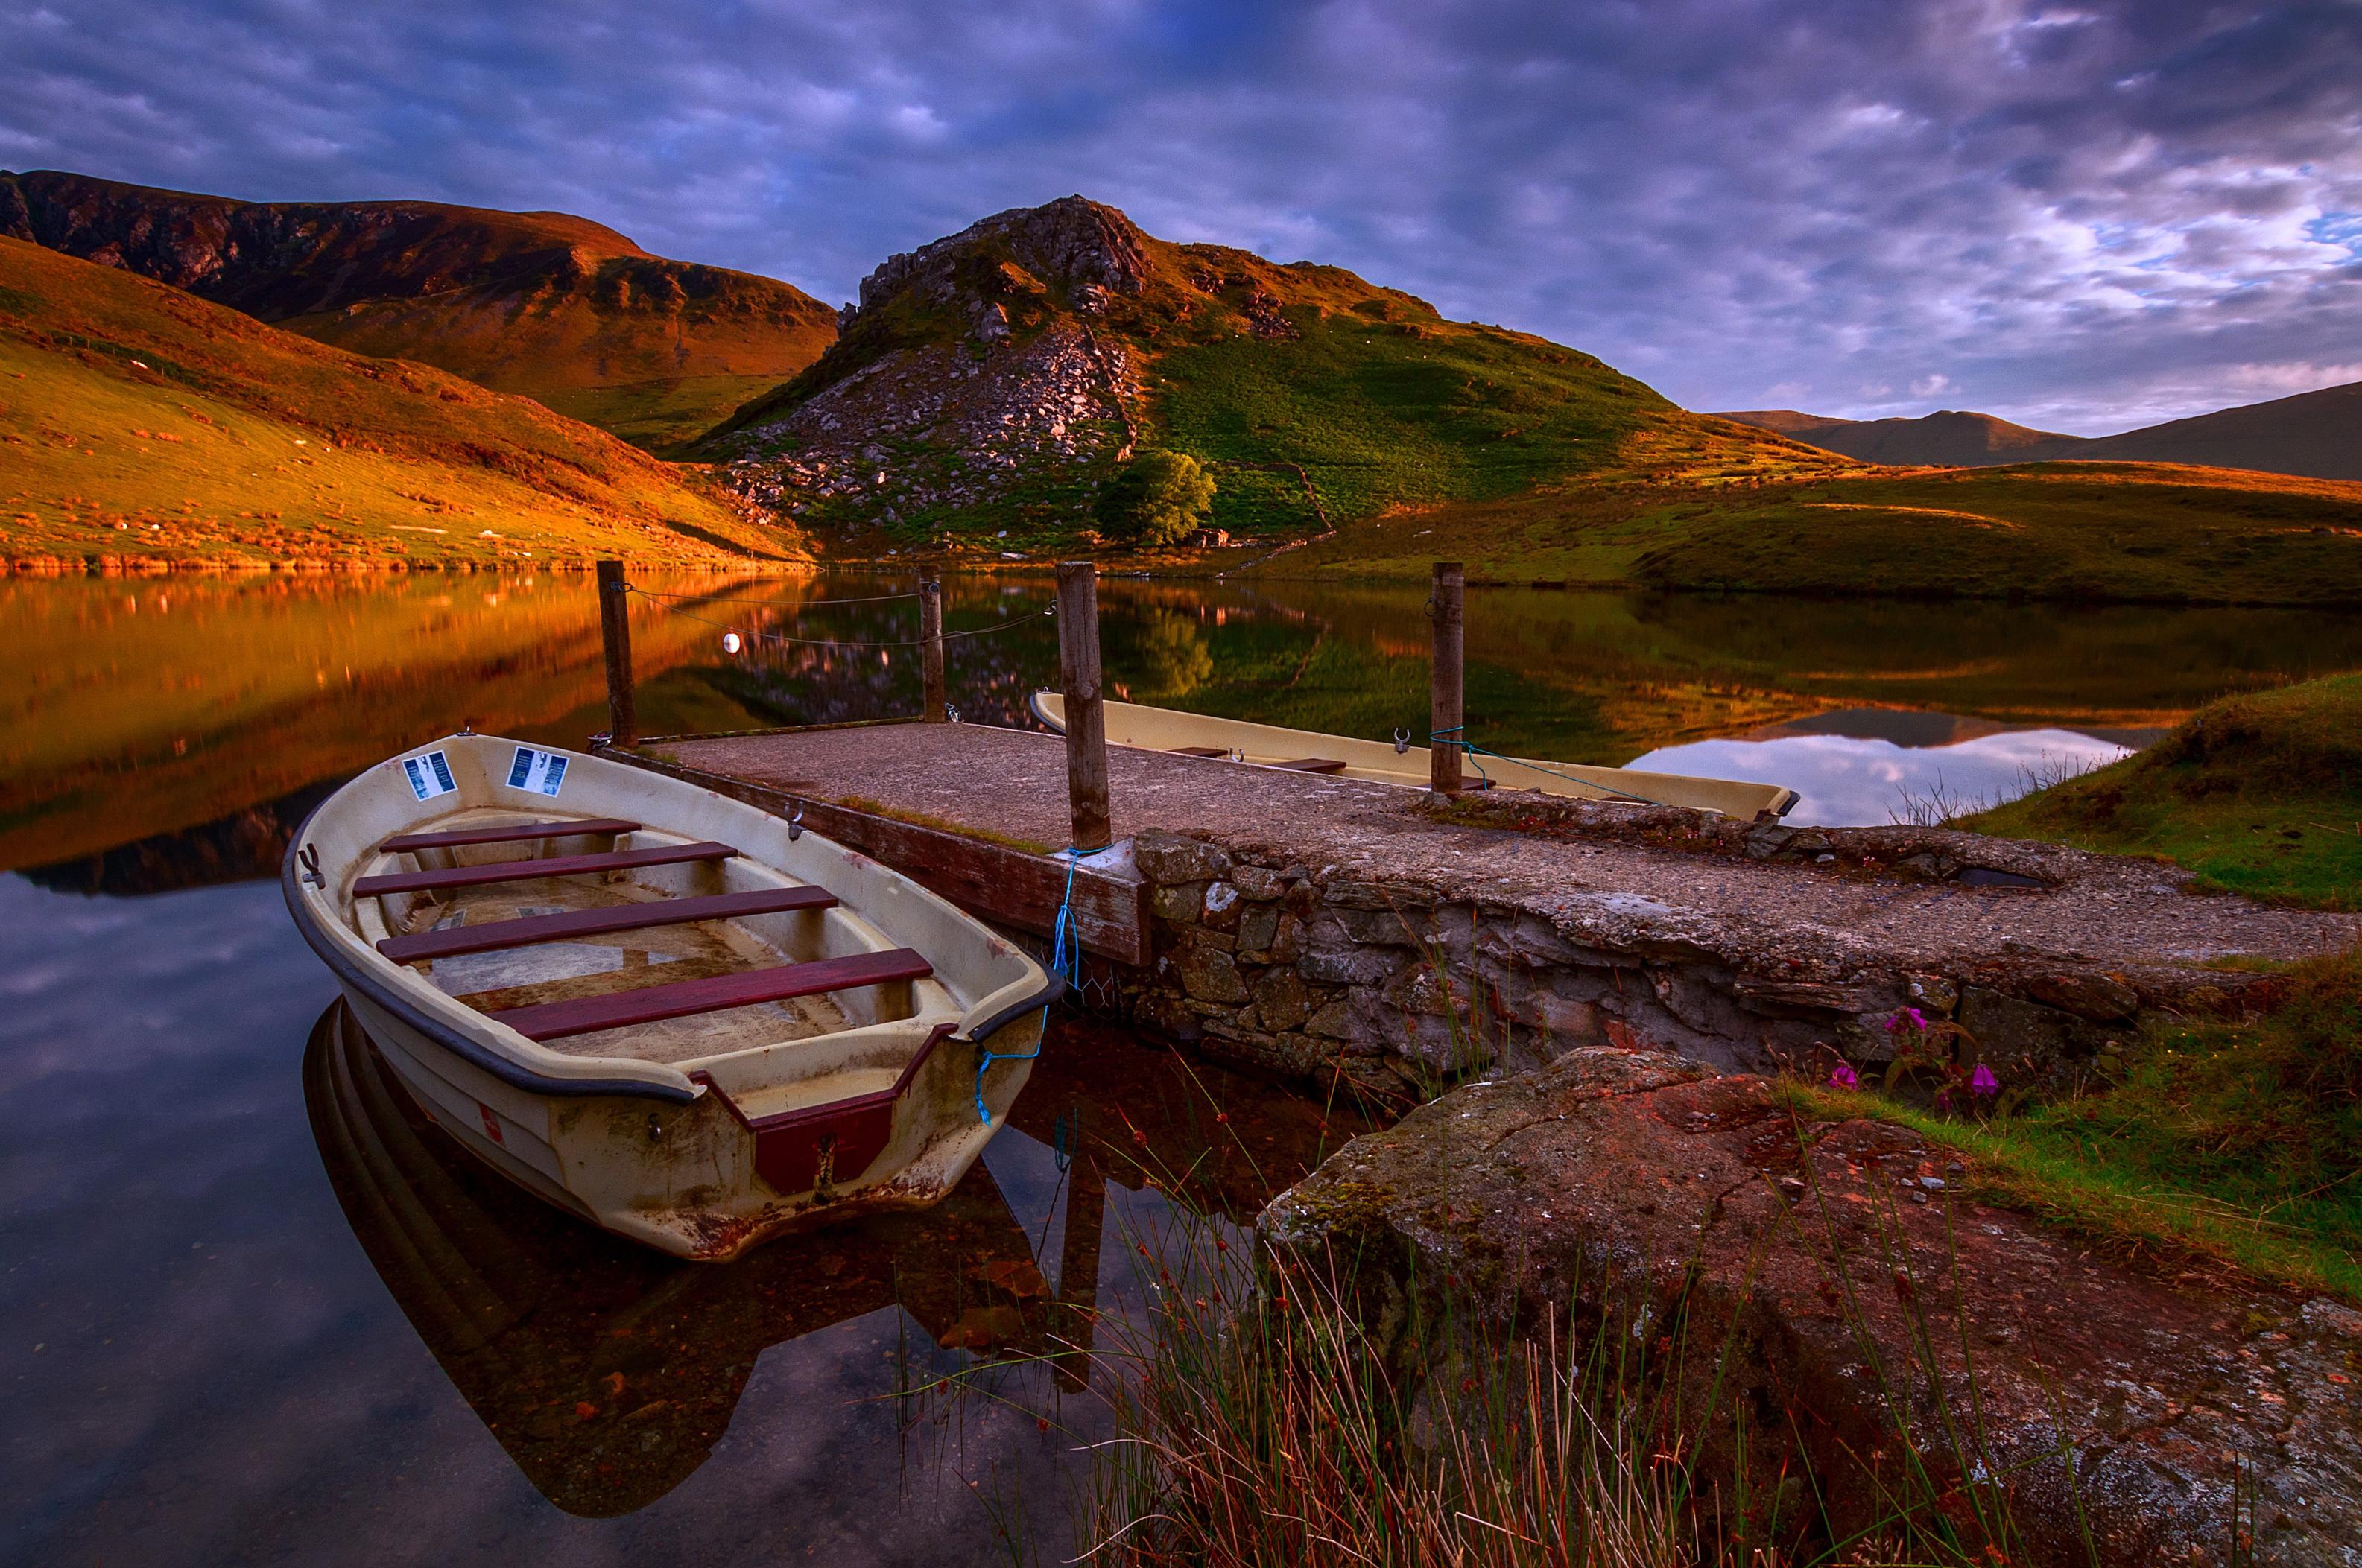 замки, озеро, лодка бесплатно